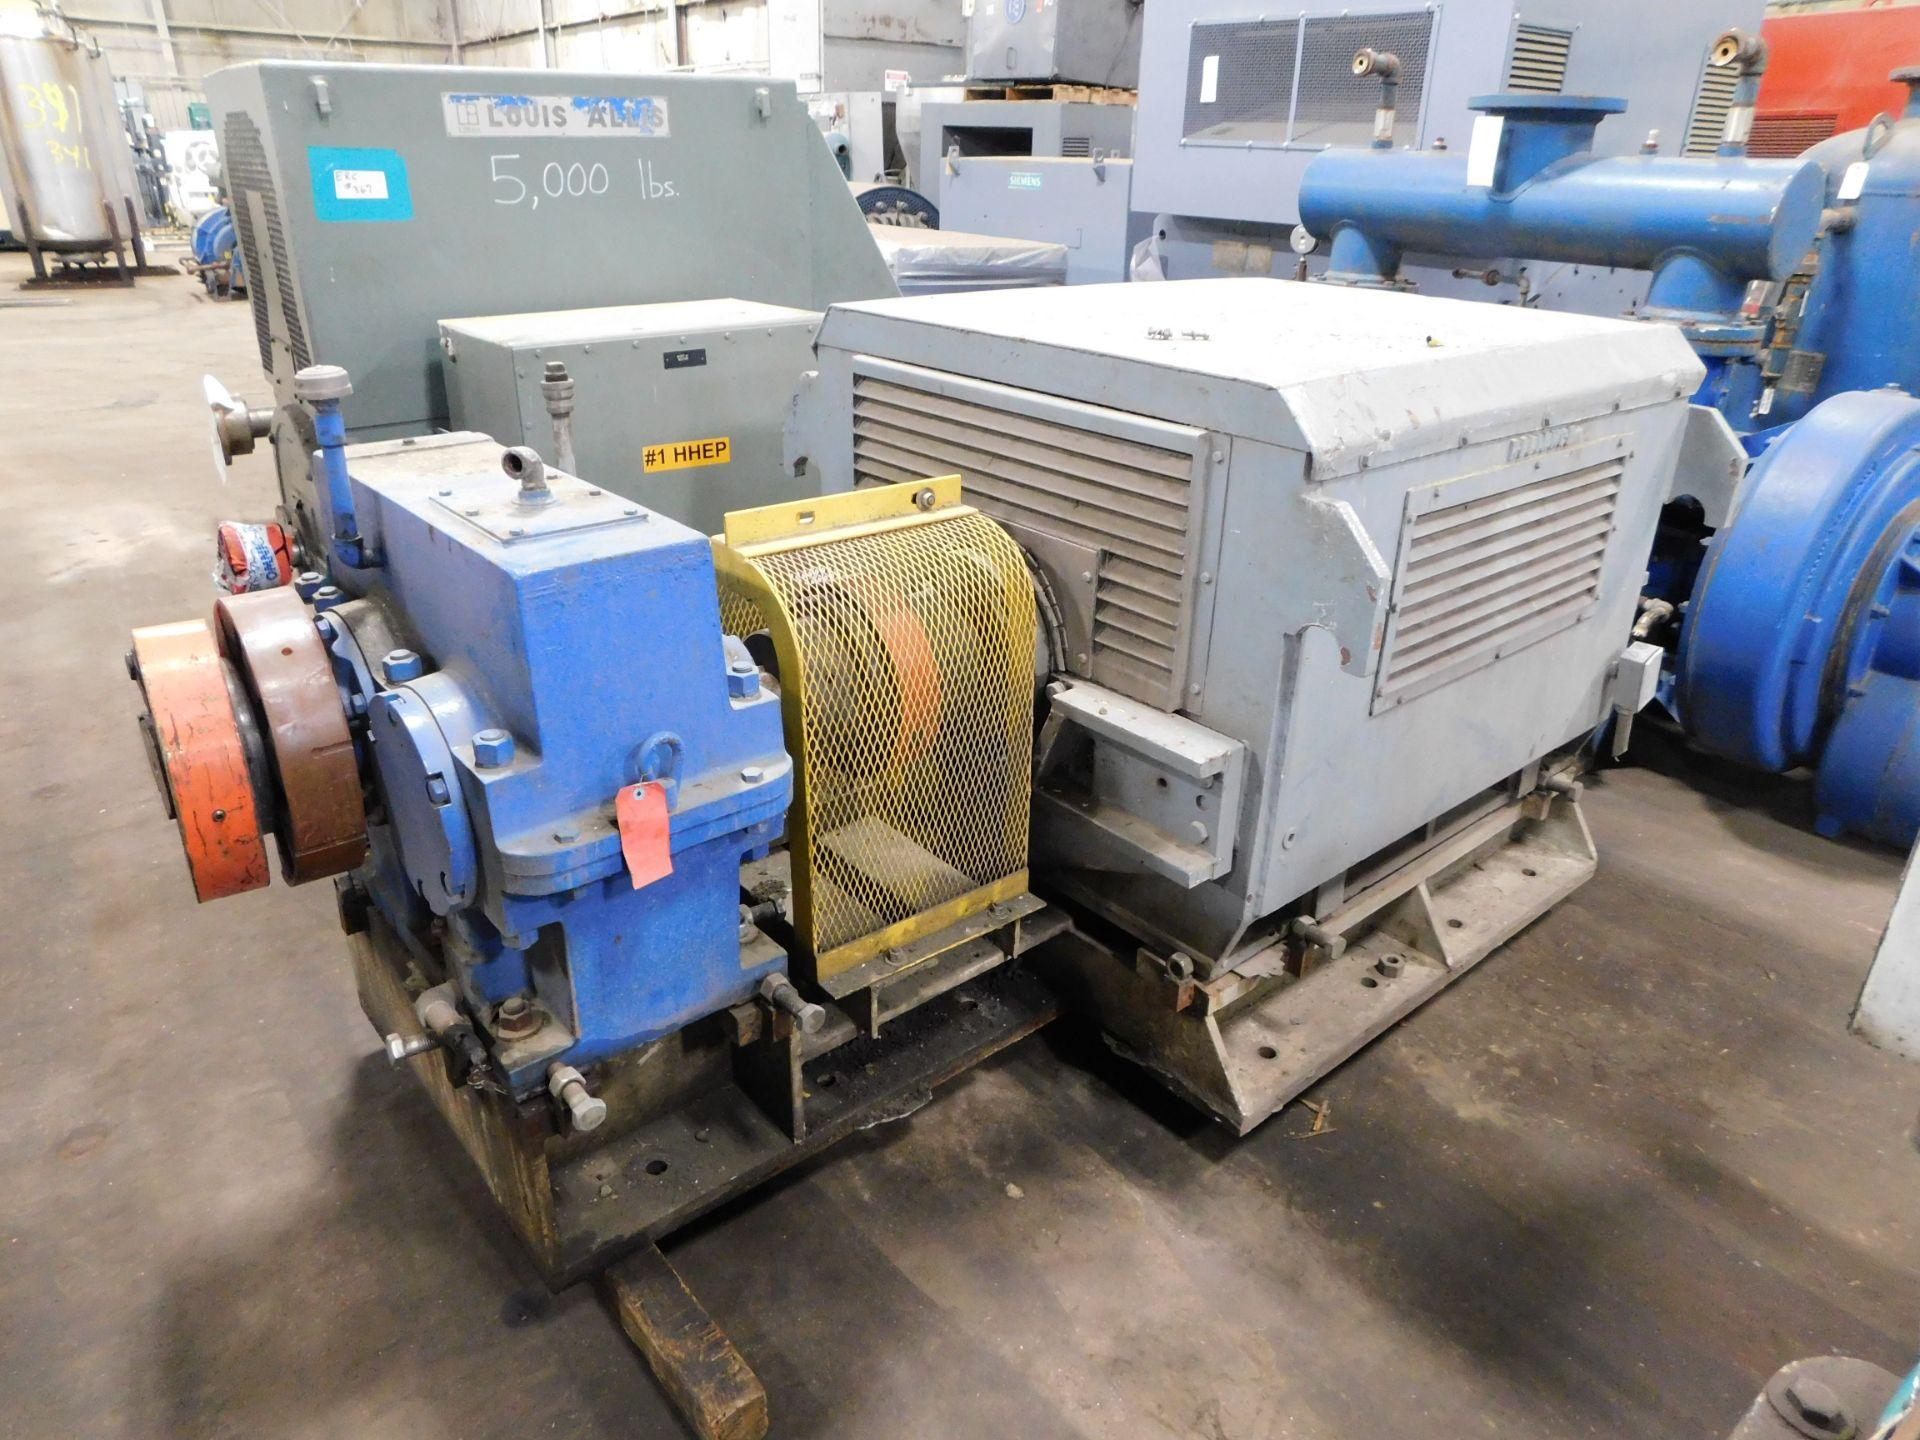 Reliance AC Duty Master Motor. 900 HP. 3 Ph. 60 Hz. 4160 V. 1789 RPM. 6809S. Type P. - Image 2 of 8